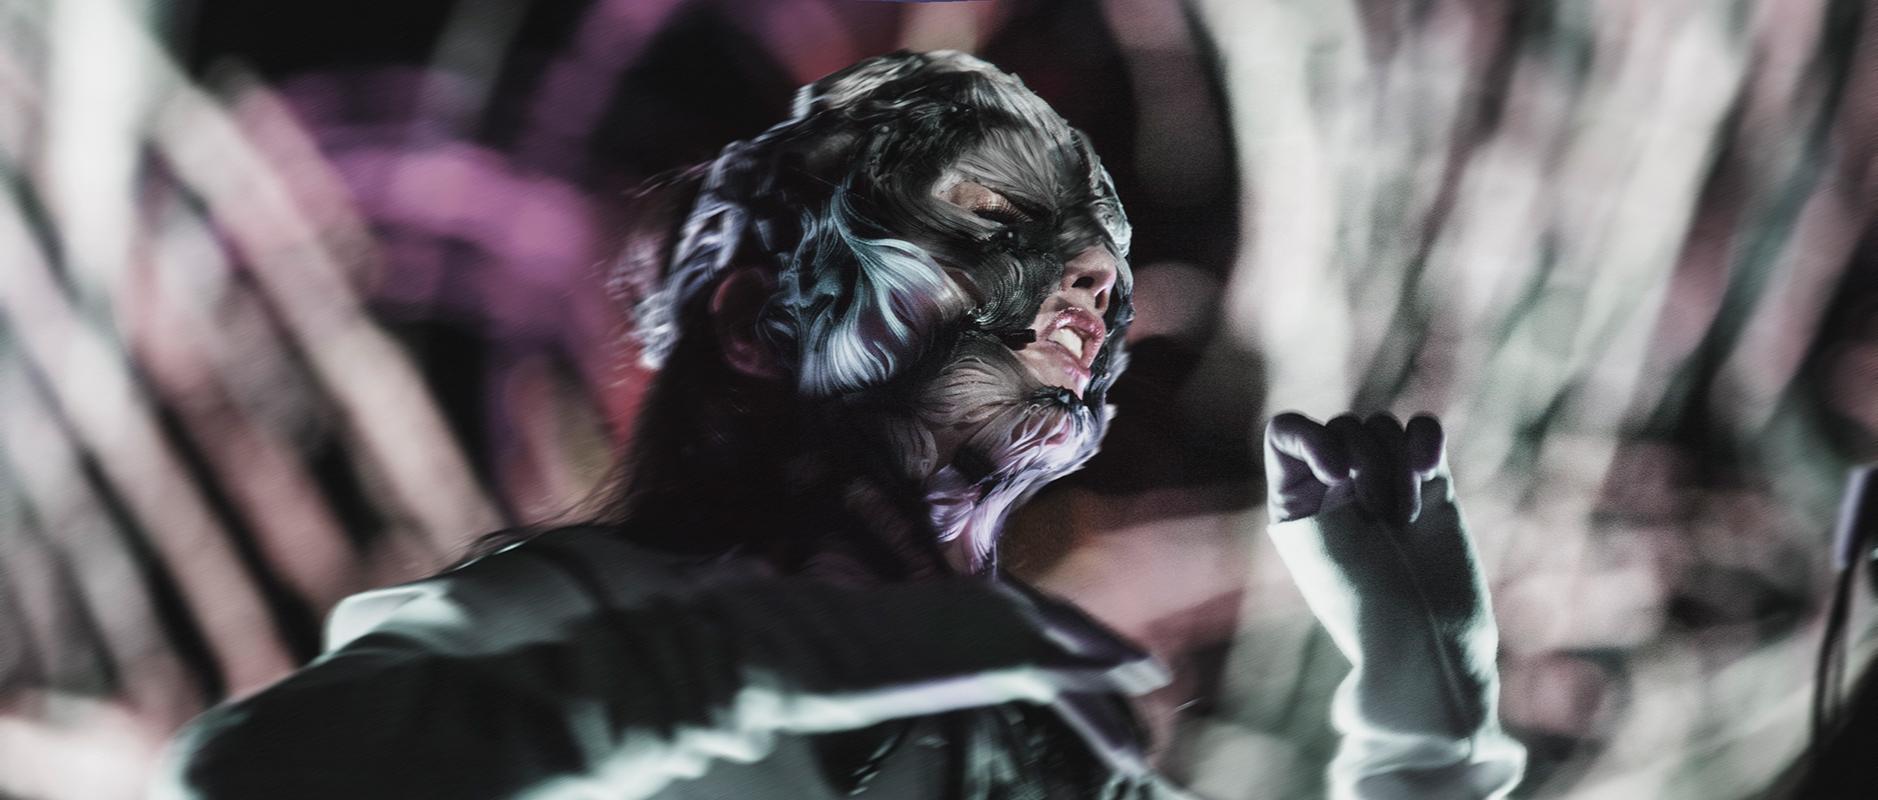 Bjork-Rottlace-3D-Mask-Stage